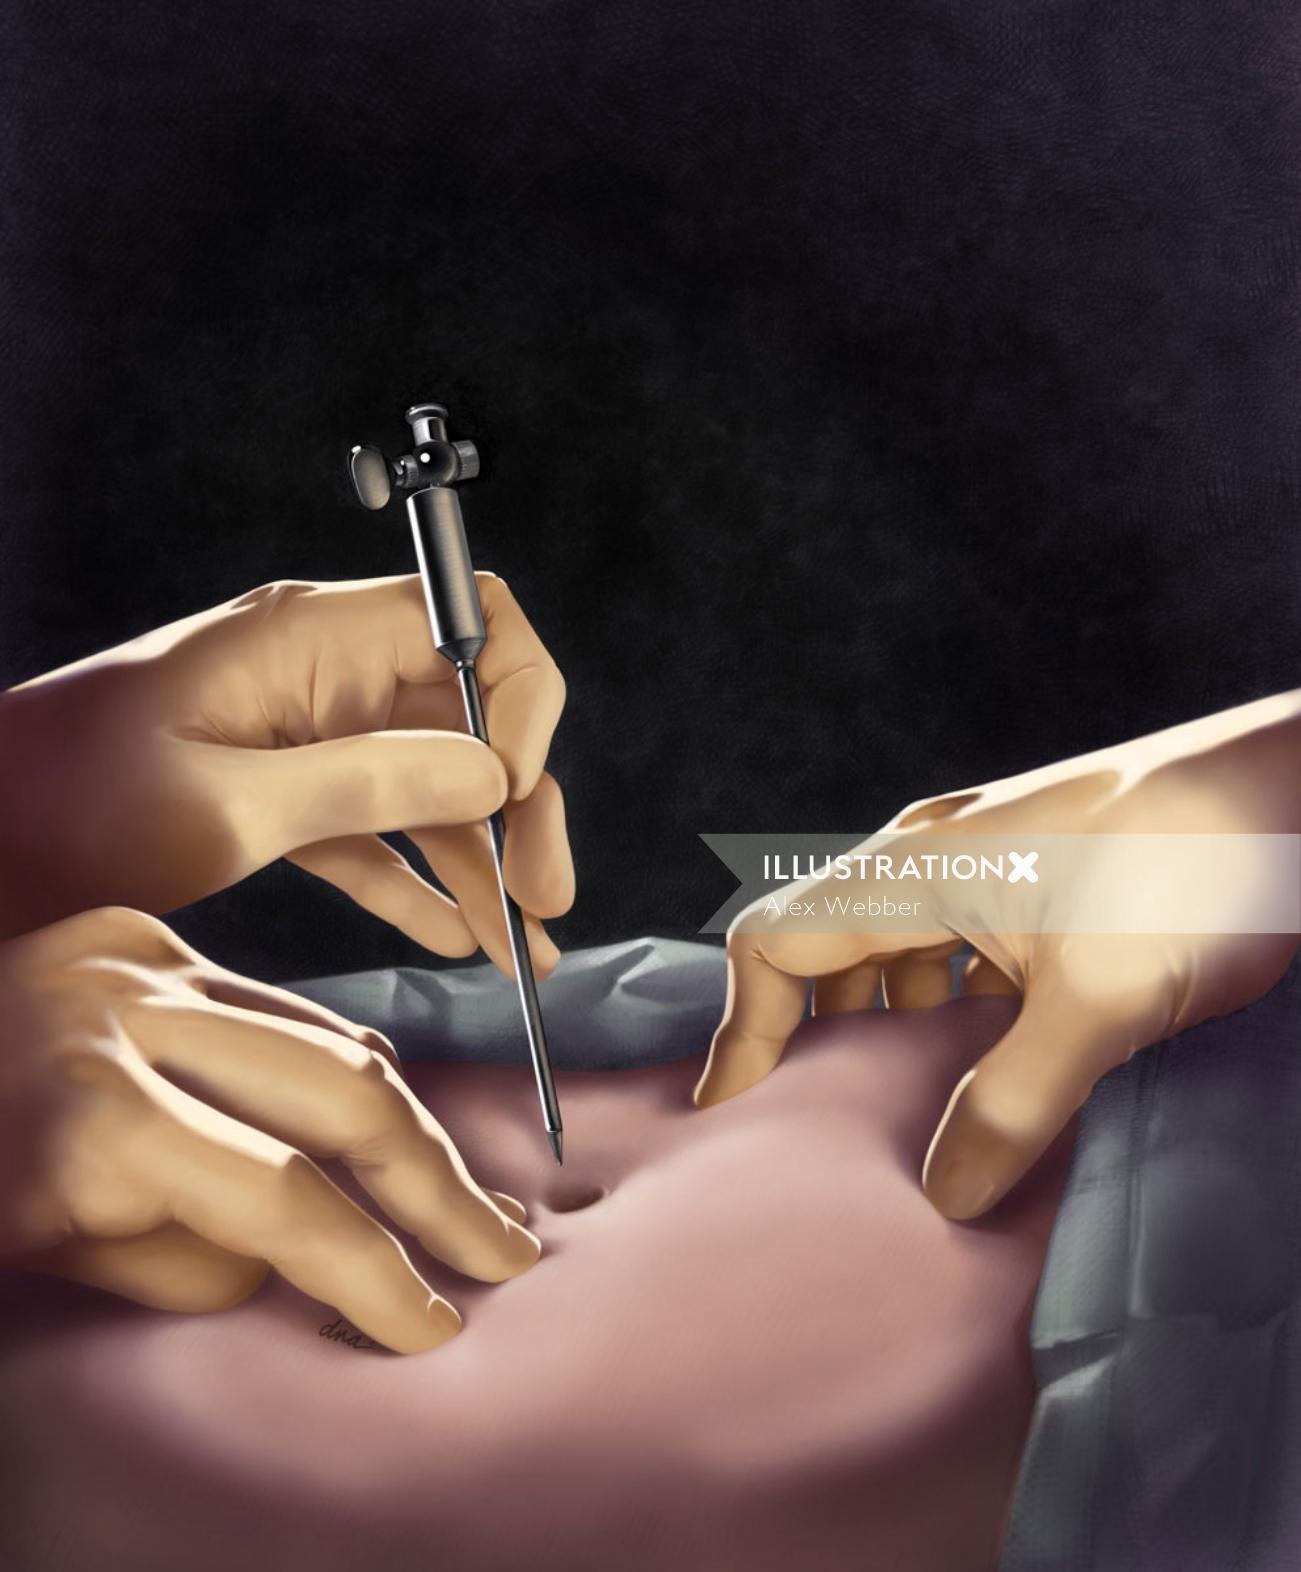 Insertion of Veress needle illustration by AlexBaker